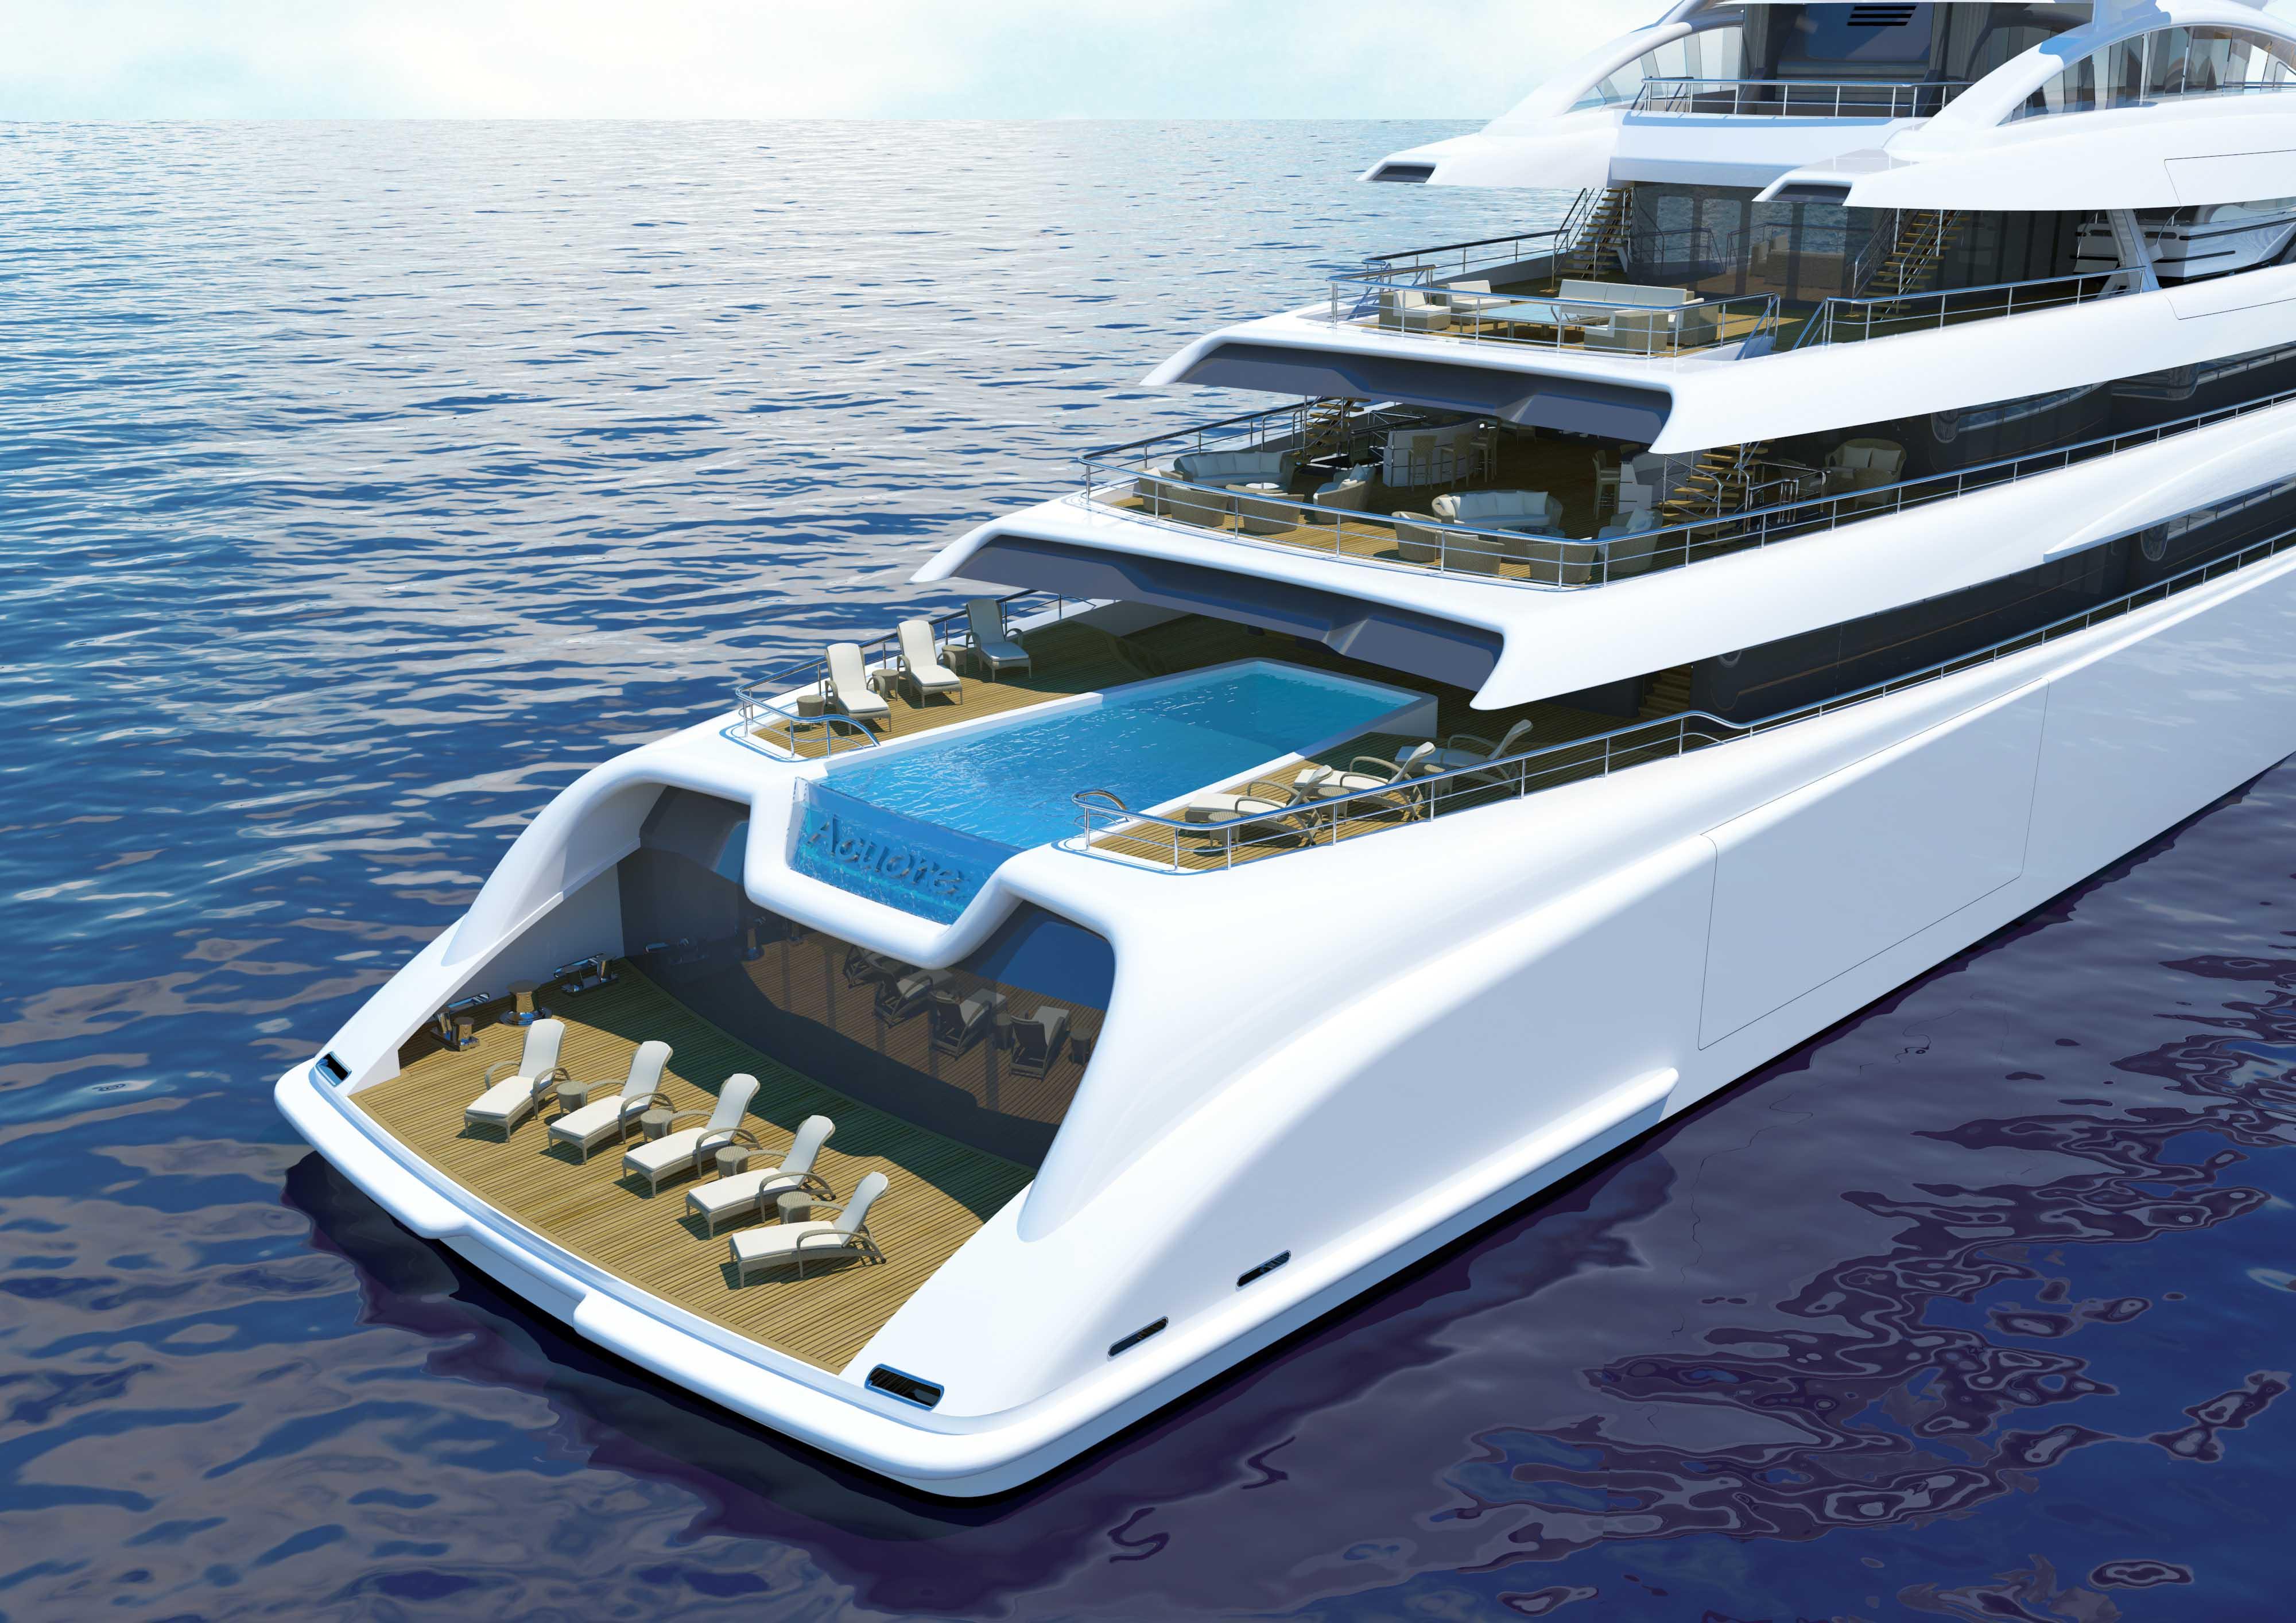 Top 10 Best Aft Decks On Luxury Yachts Yacht Charter